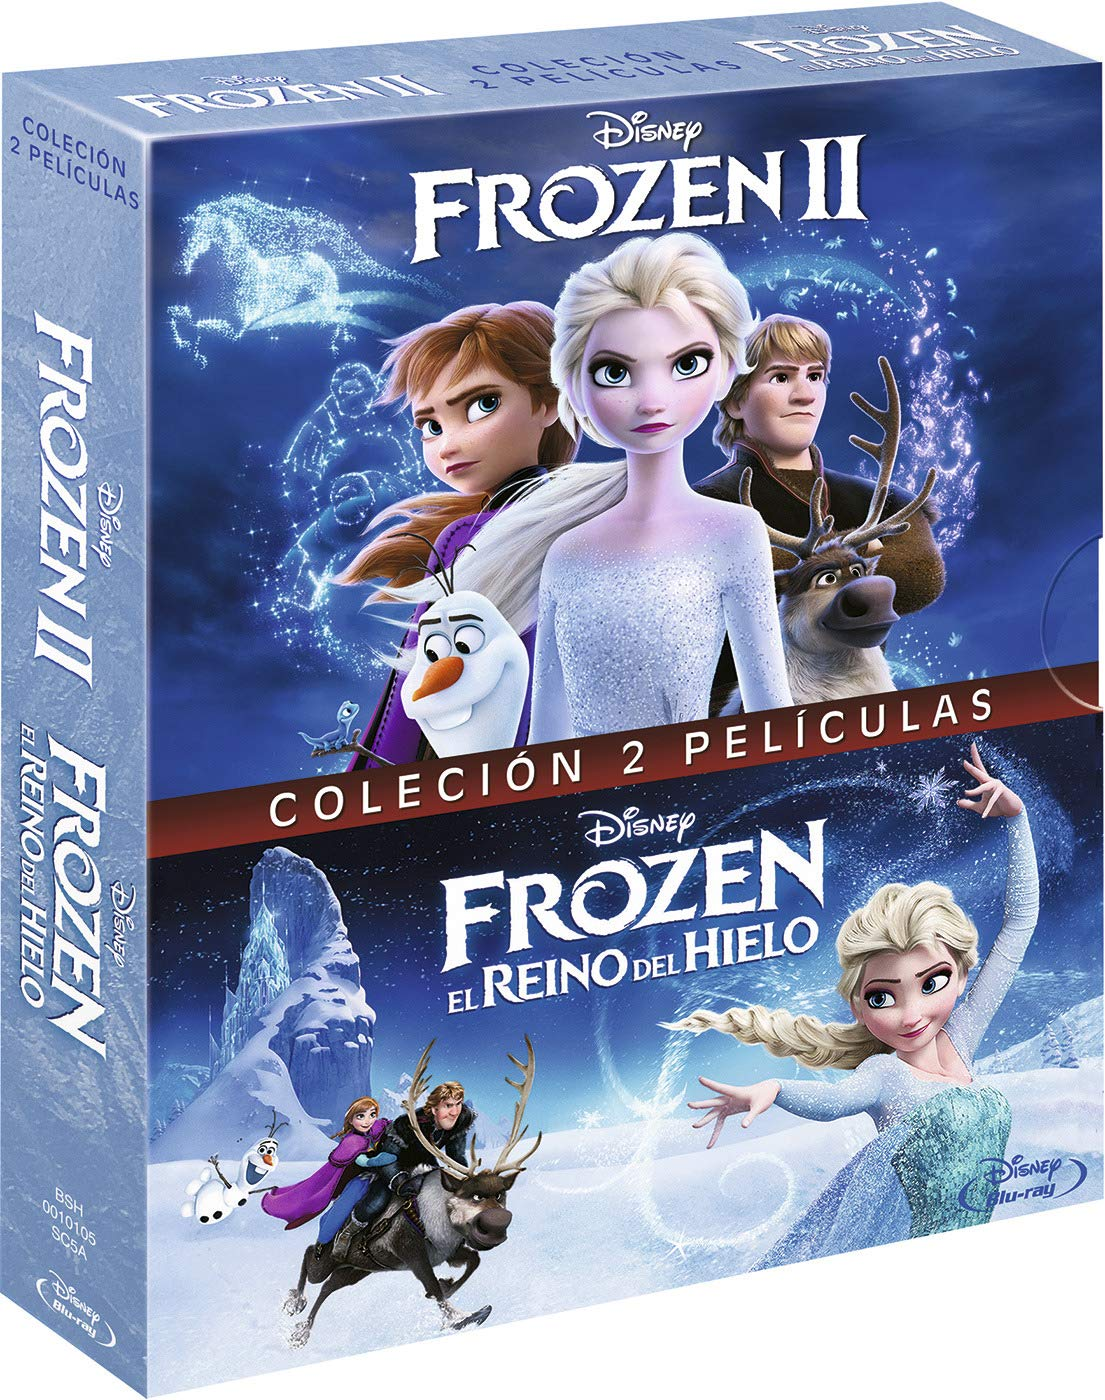 Pack: Frozen + Frozen 2 (BD) [Blu-ray]: Amazon.es: Personajes animados, Personajes animados: Cine y Series TV